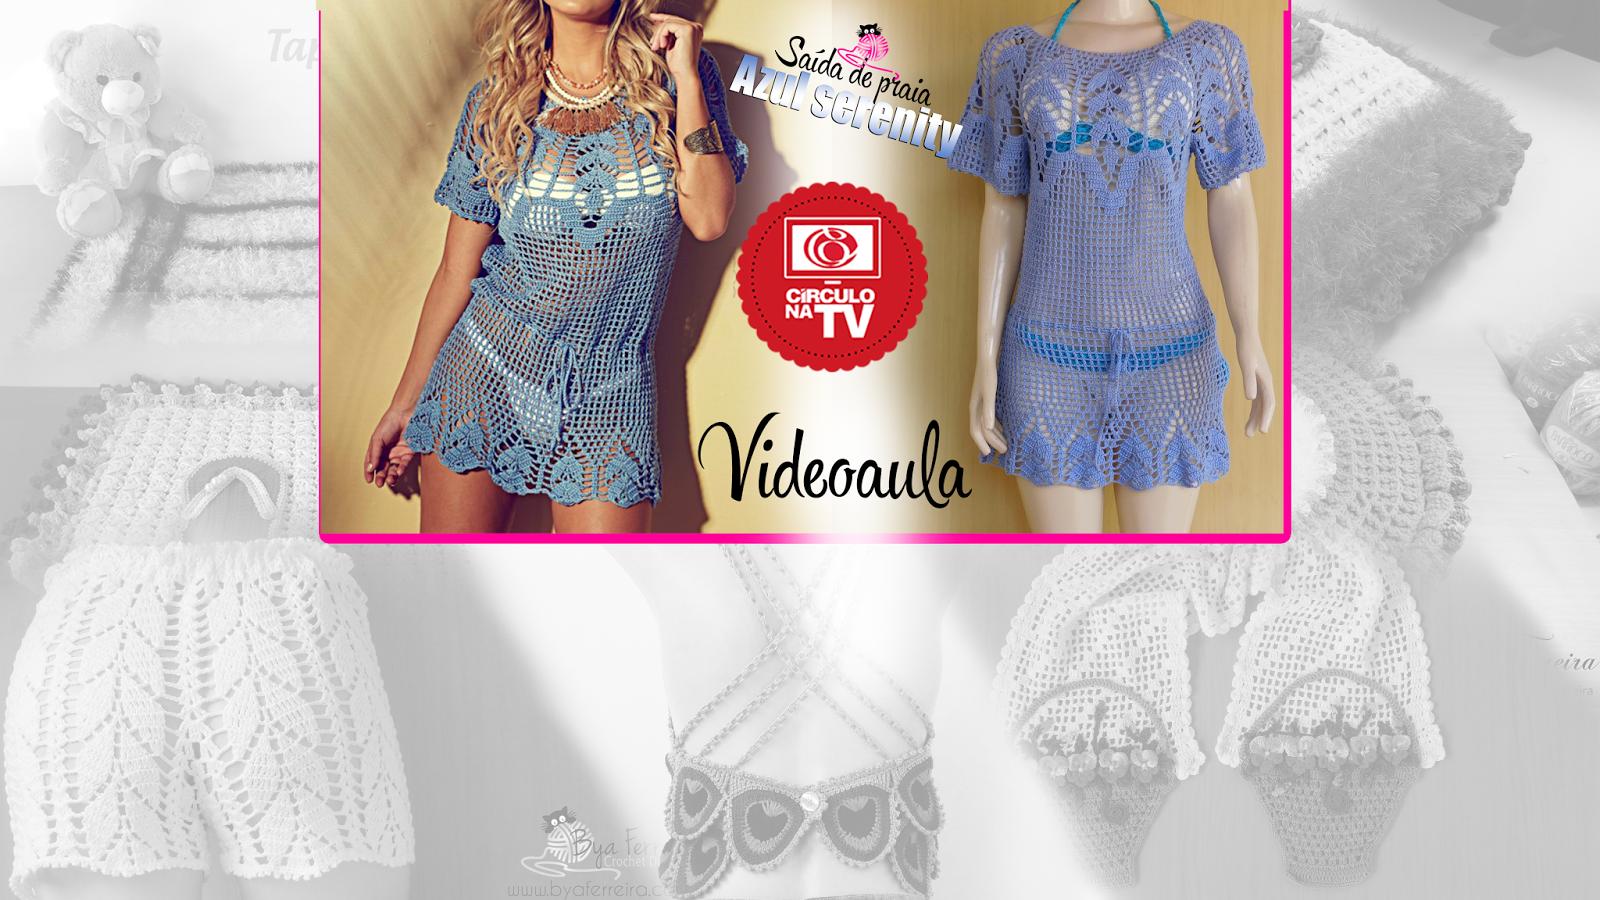 58d25fdef Bya Ferreira - Crochet Designer: Círculo na TV | Saída de praia Azul ...